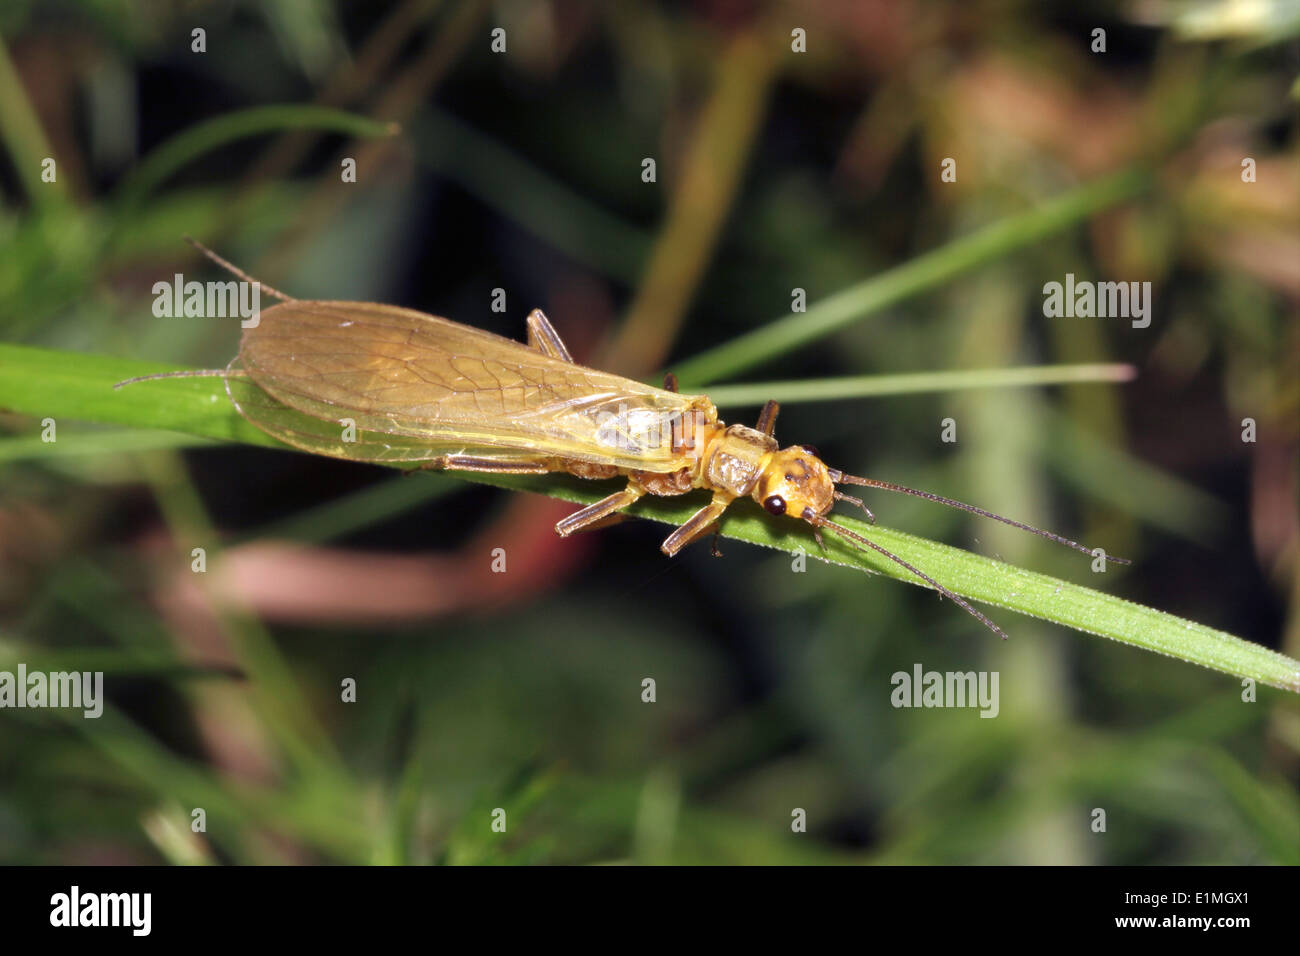 Small yellow sally stonefly (Chloroperla torrentium : Chloroperlidae) beside a fast-flowing stream, UK. - Stock Image